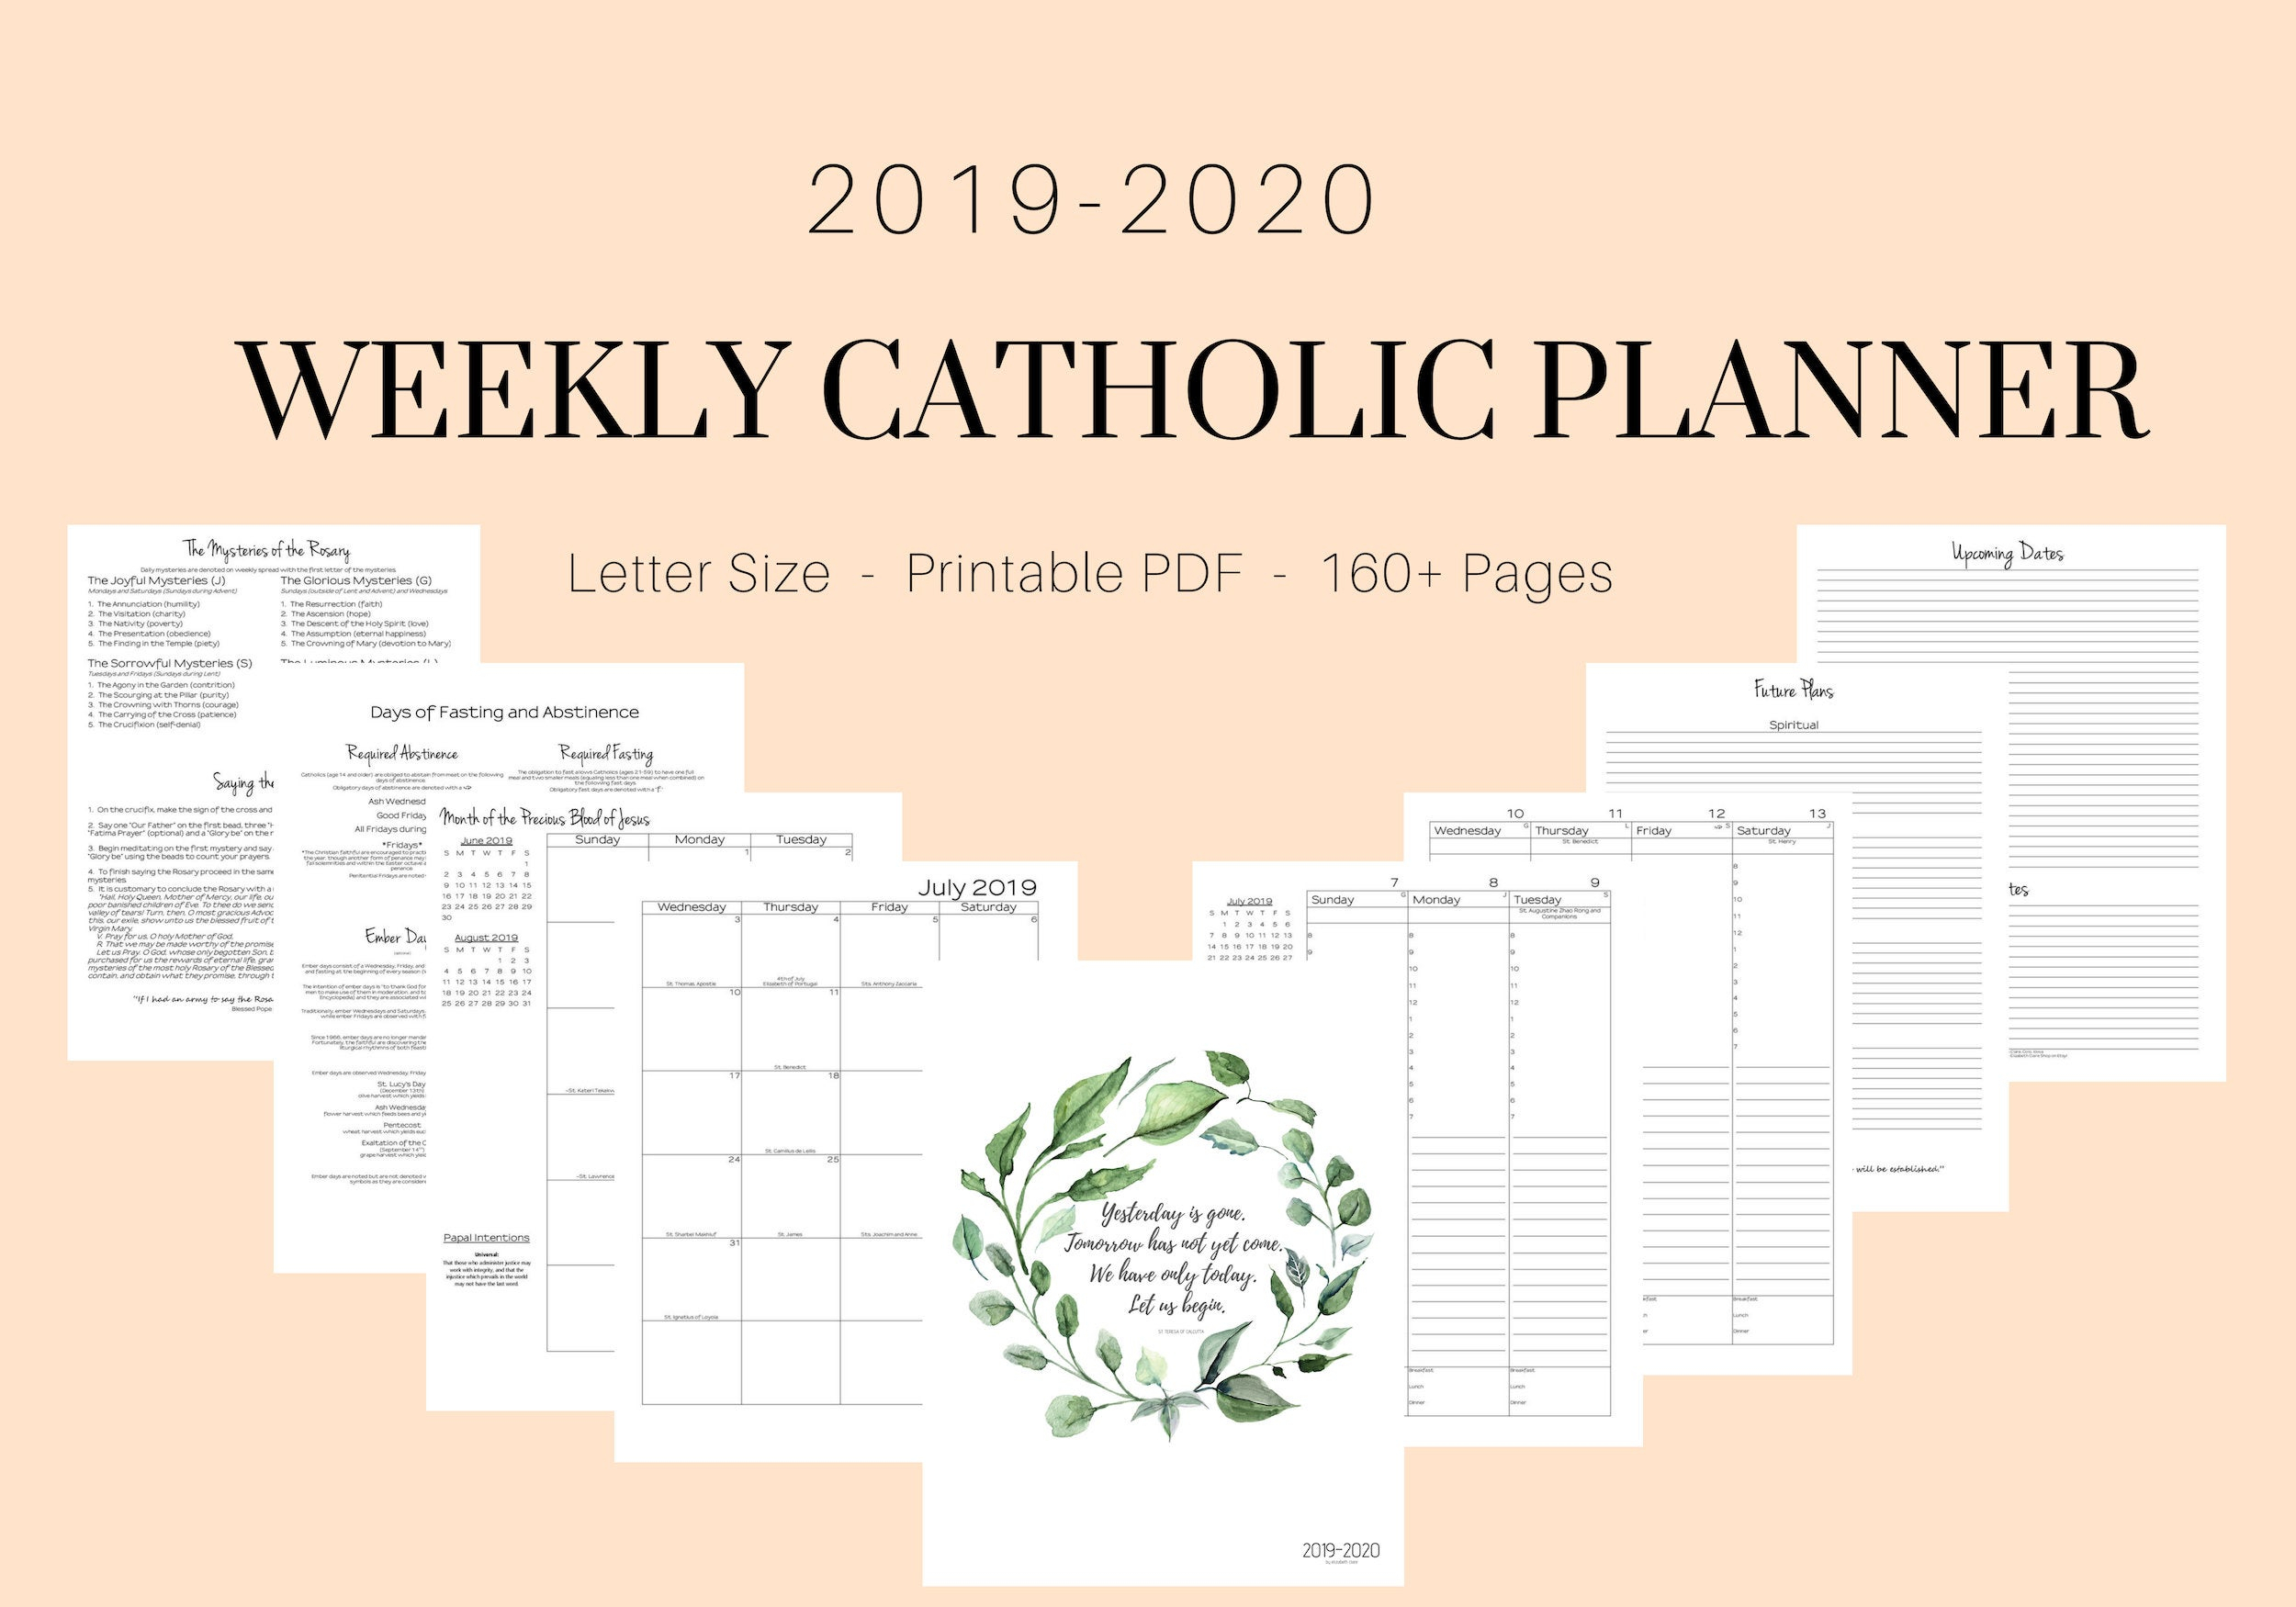 2019 - 2020 Catholic Planner Weekly Printable: Daily Planner / Weekly  Calendar / Liturgical Planner / Printable Catholic Planner with regard to Catholic Liturgical Calendar Year C 2019-2020